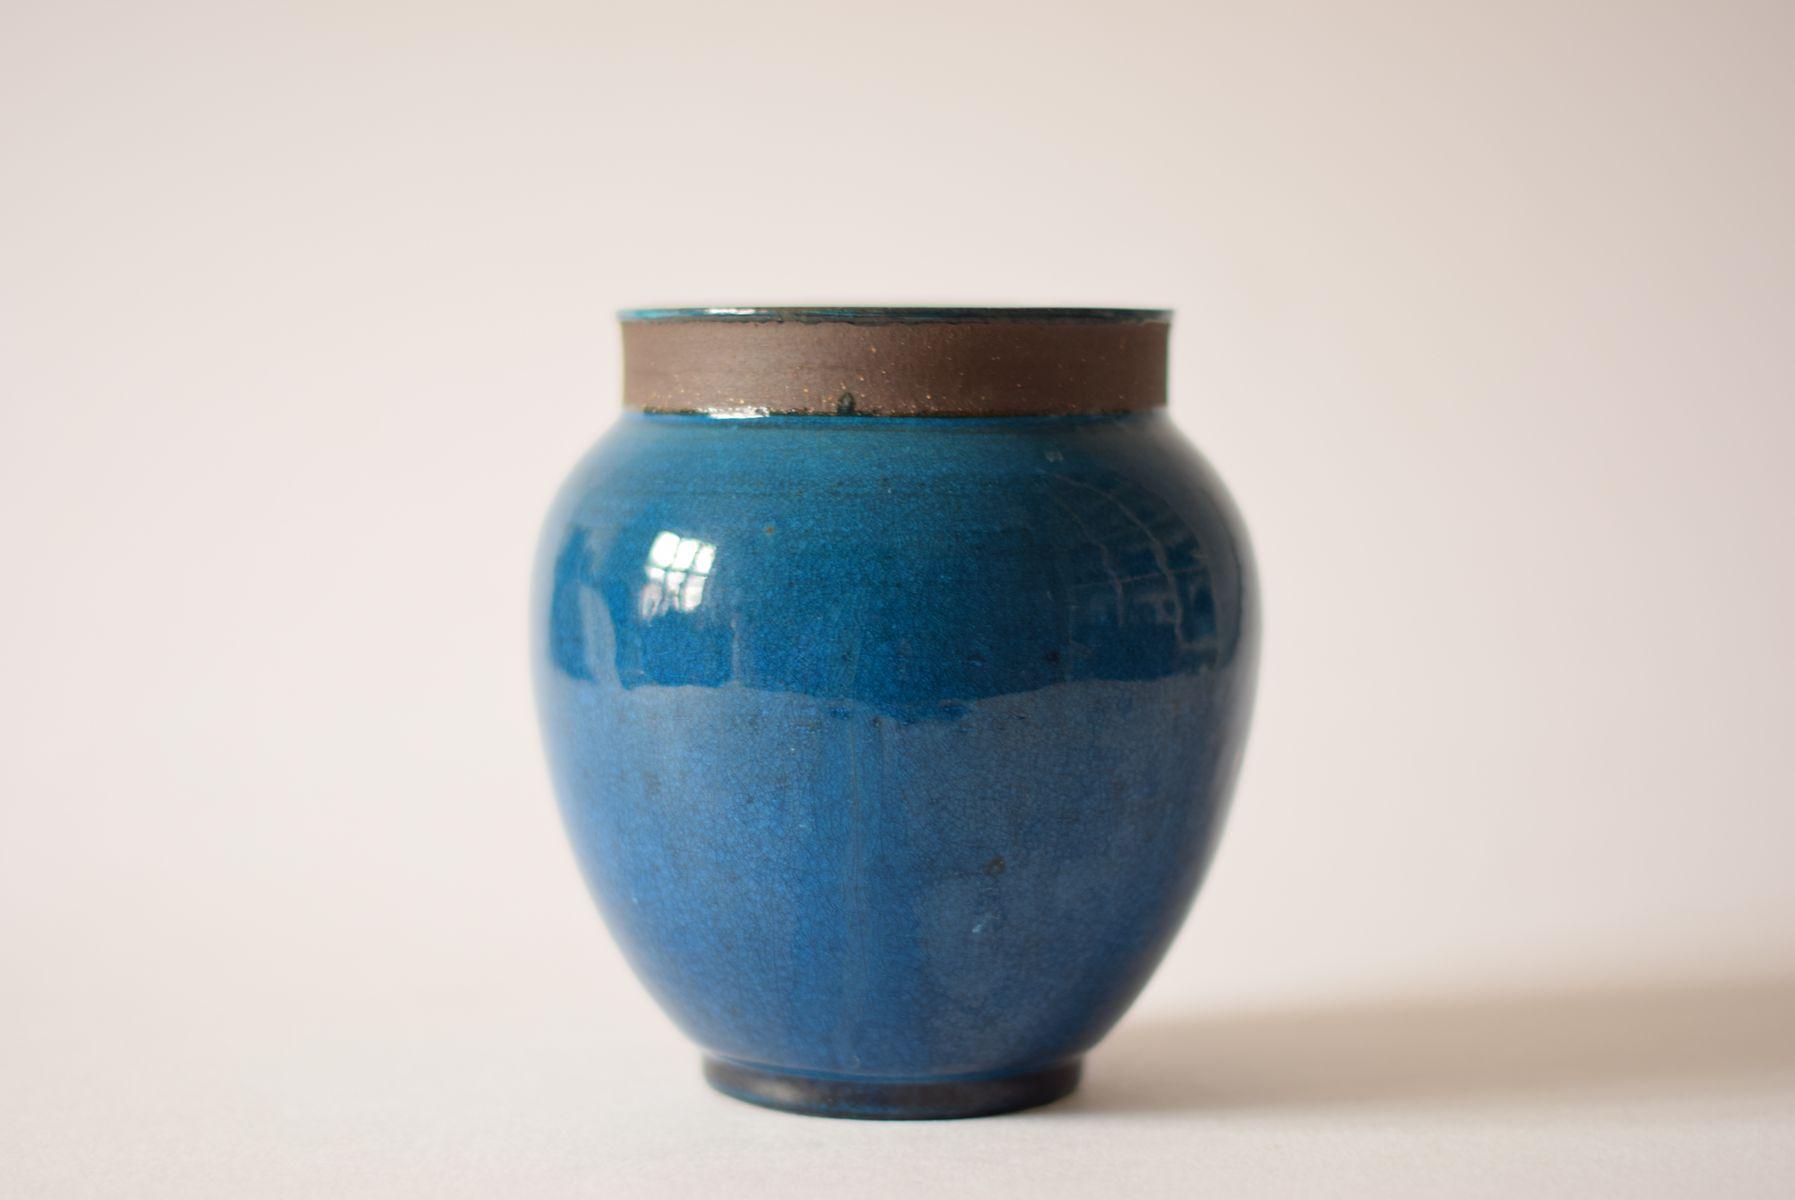 mid century danish turquoise vase from k hler hak 1960s for sale at pamono. Black Bedroom Furniture Sets. Home Design Ideas